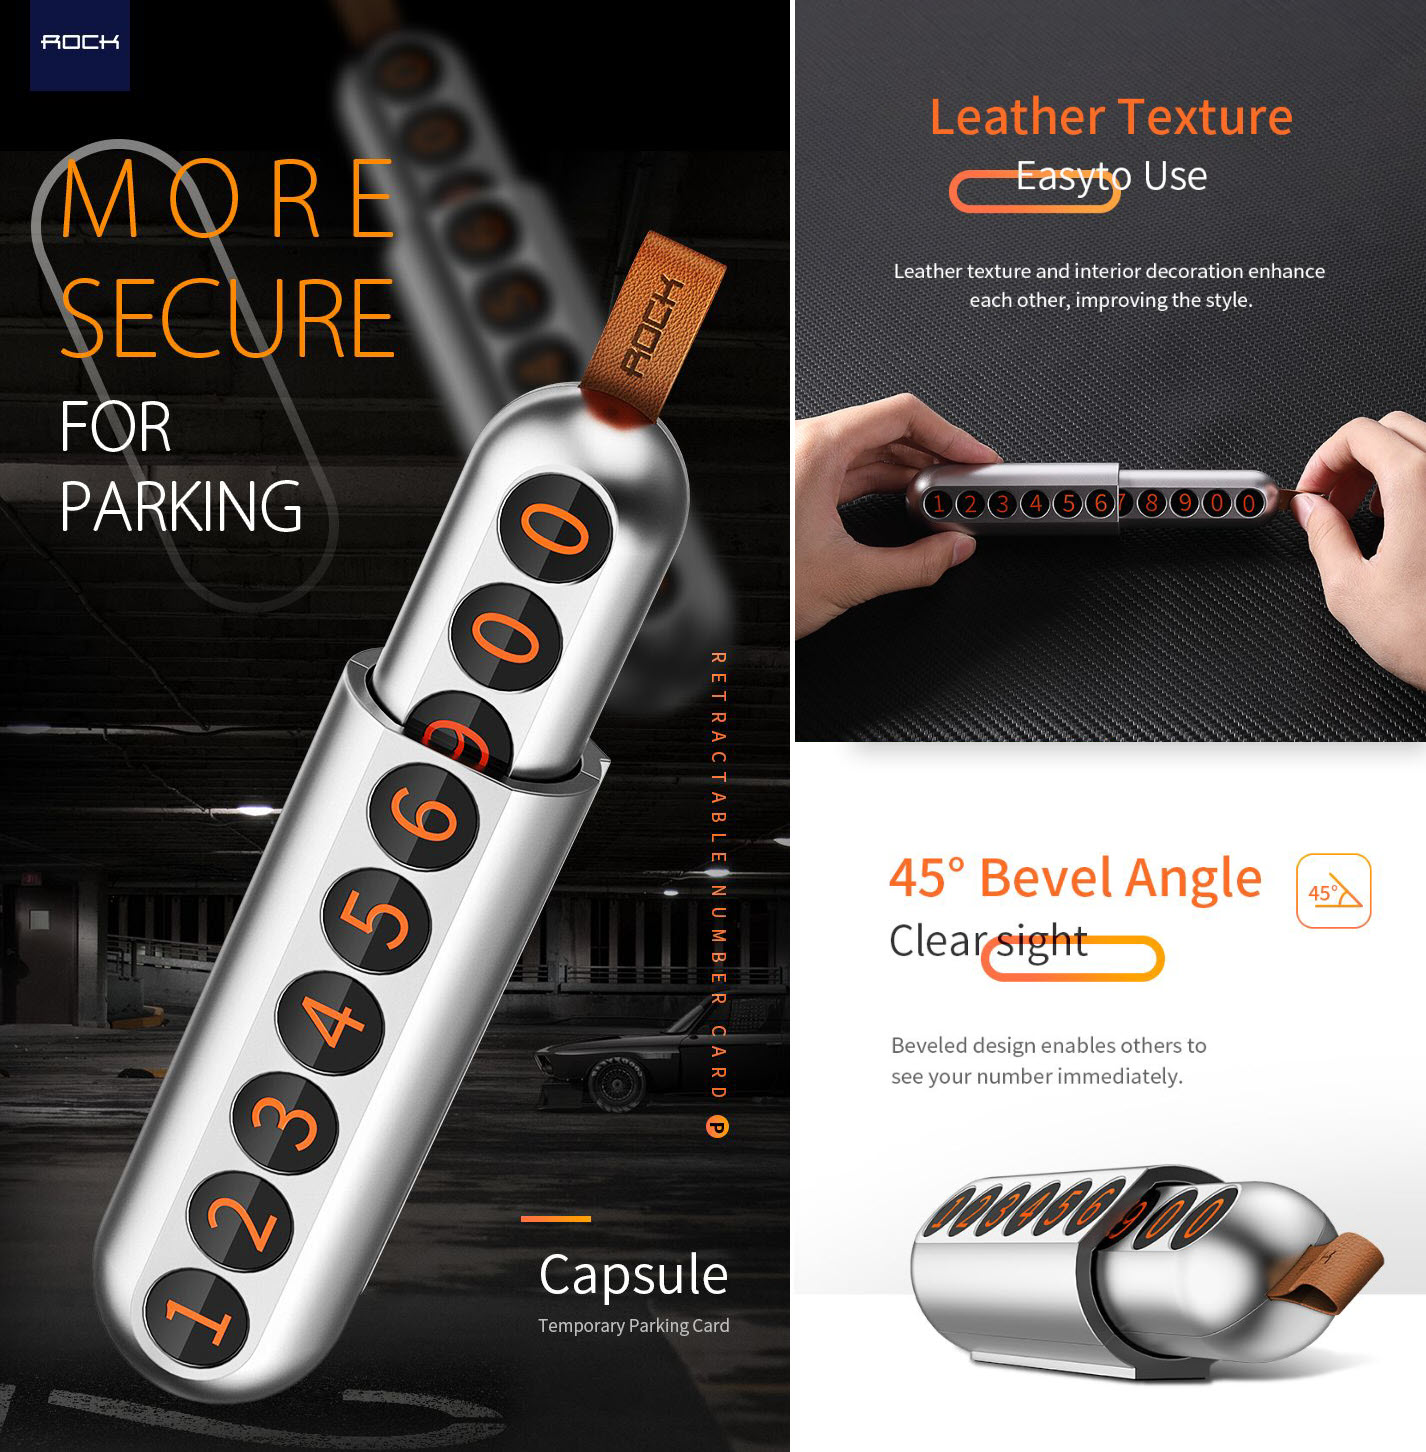 Rock Retractable Parking Number Card Capsule (1)